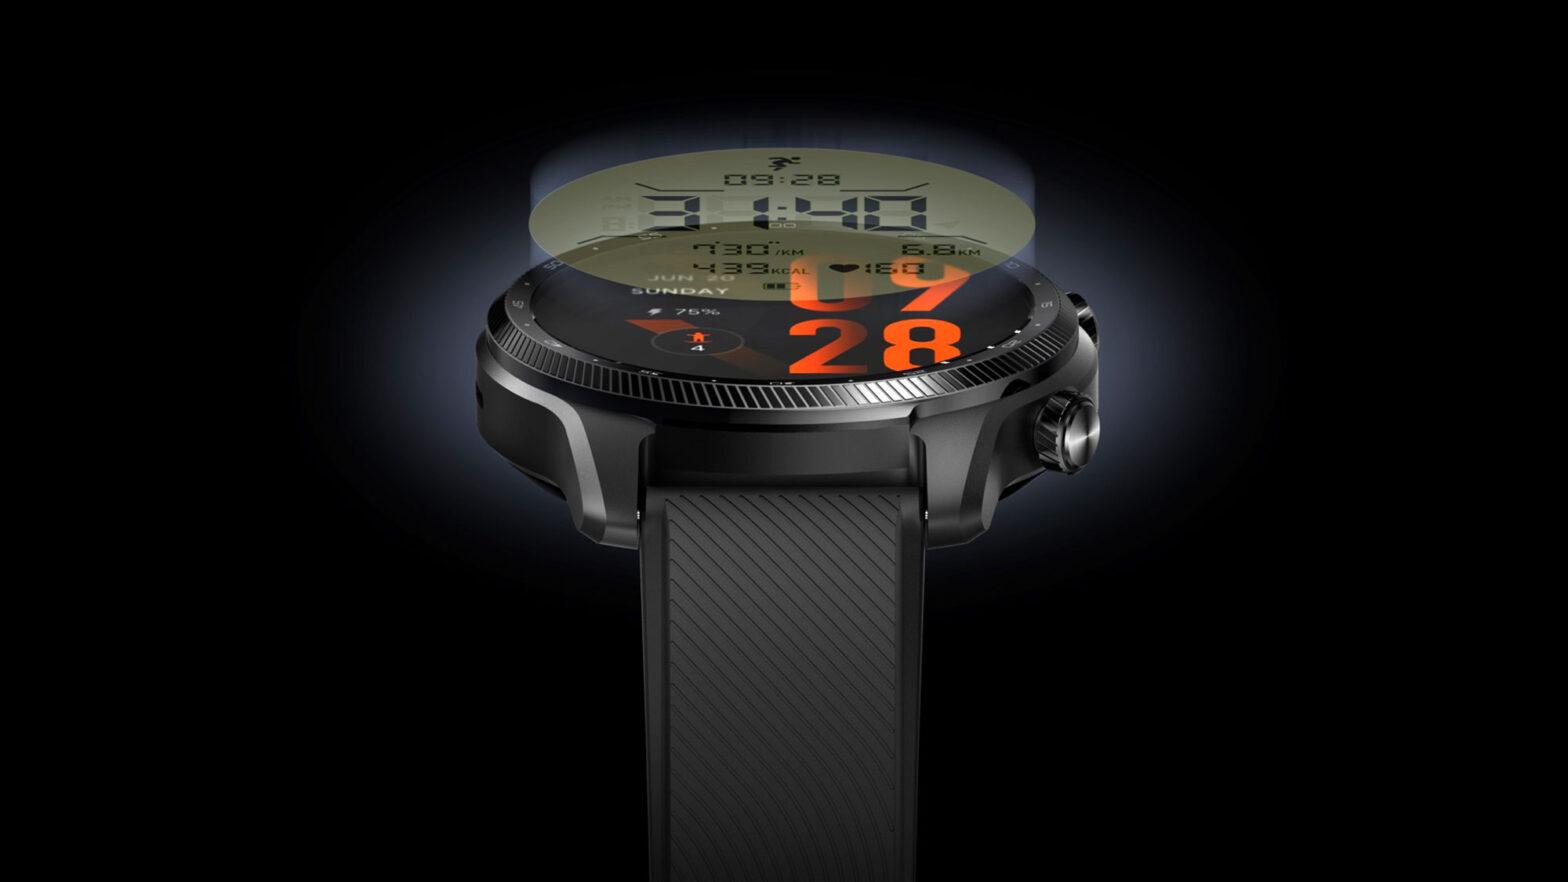 TicWatch Pro 3 Ultra GPS Smartwatch Announced